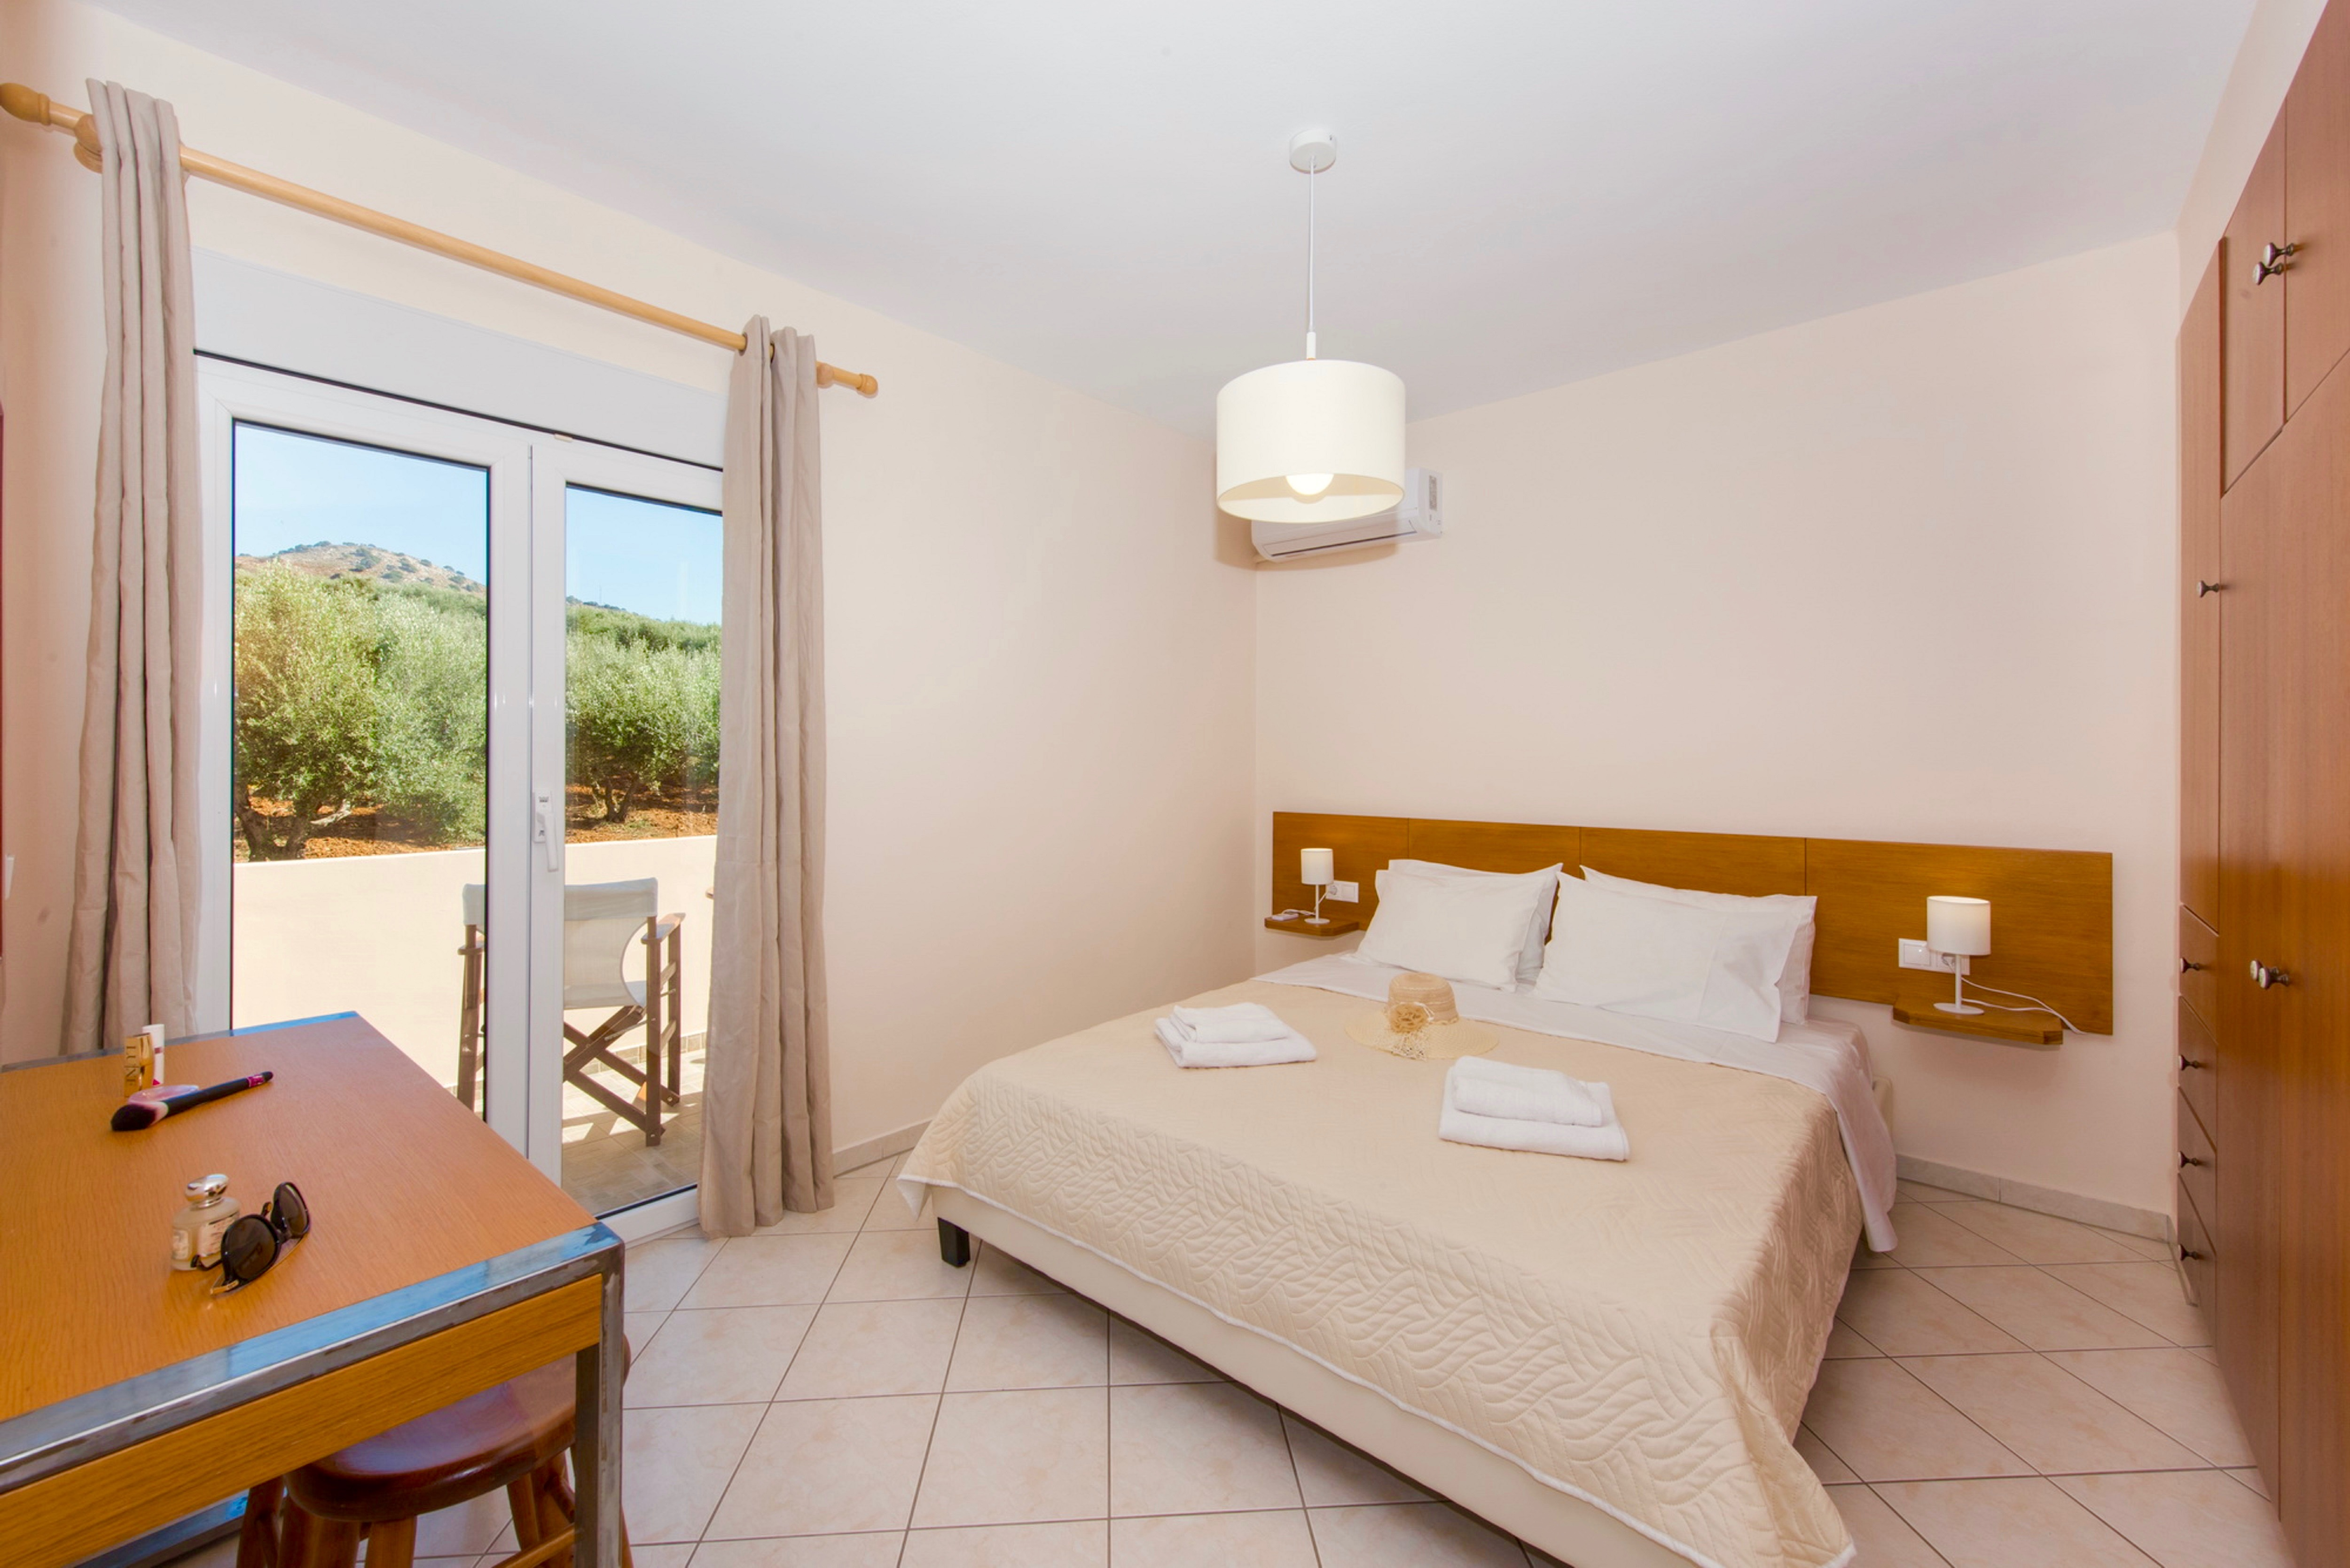 Ferienhaus Luxury Villa Korini with private swimming pool (2470495), Roumeli, Kreta Nordküste, Kreta, Griechenland, Bild 40